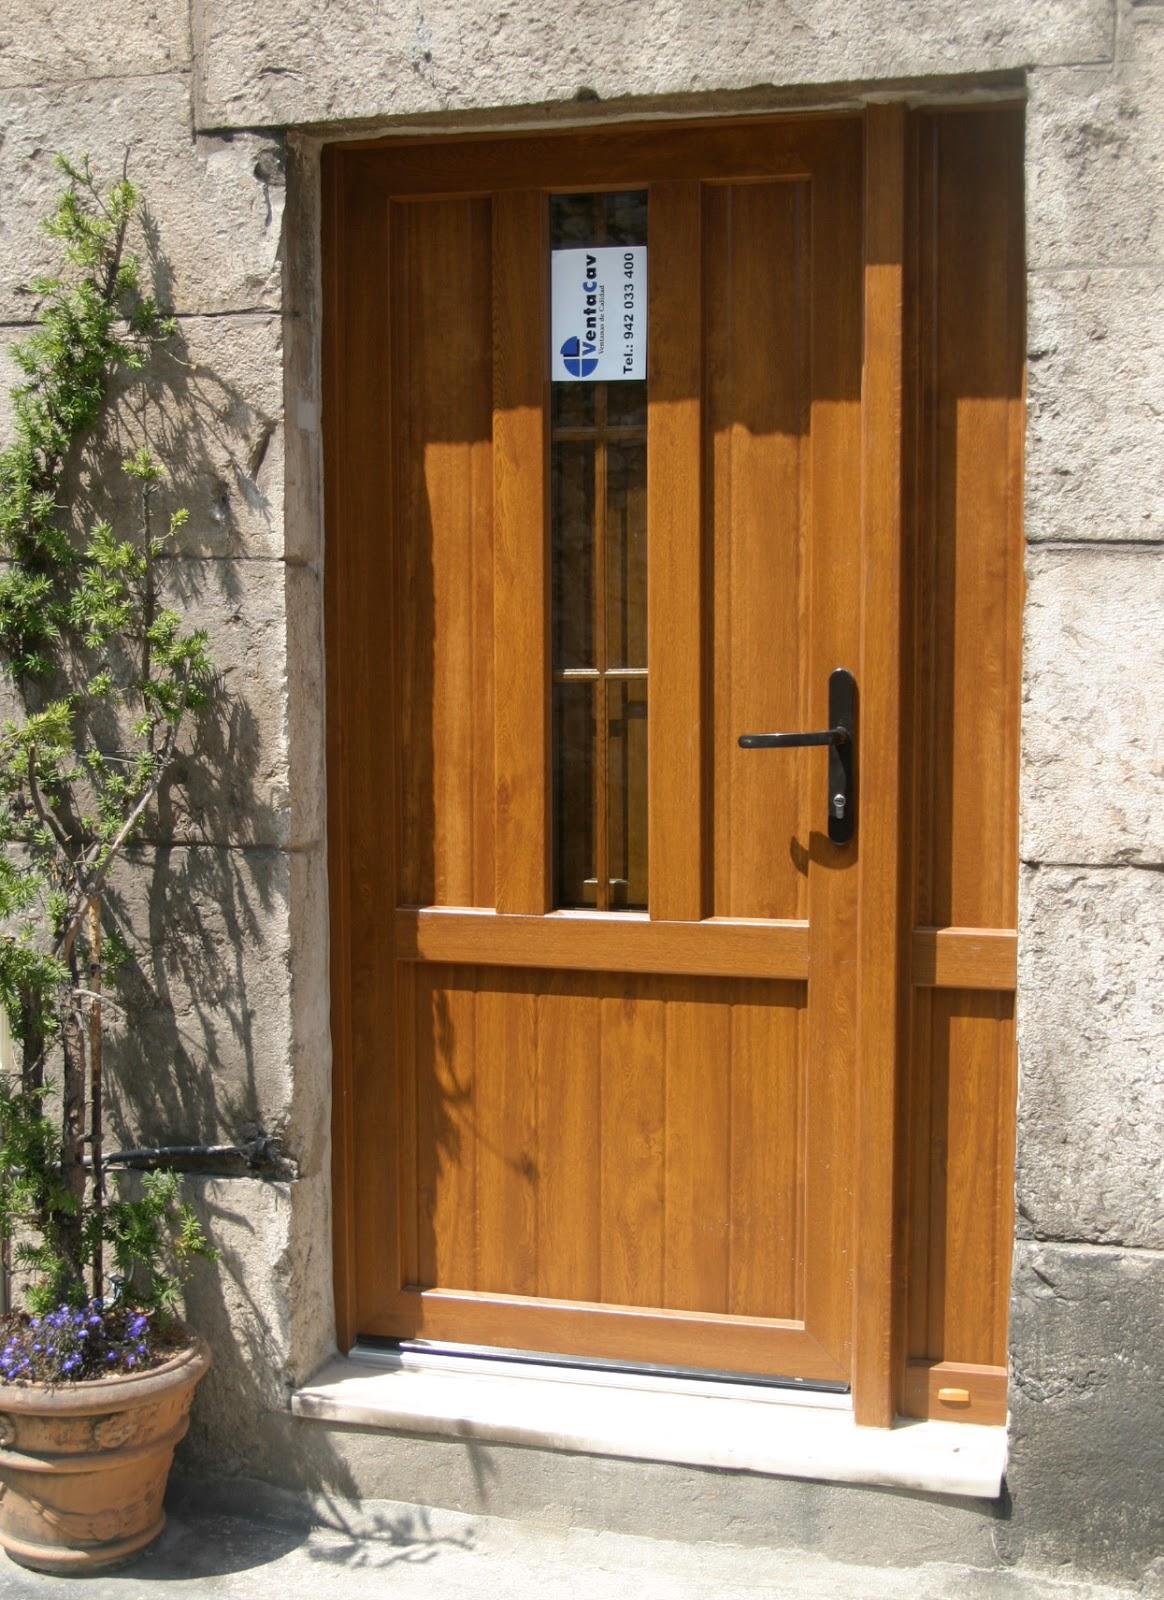 Ventanas de pvc o aluminio ventanas y puertas de for Puertas de pvc para exterior precios